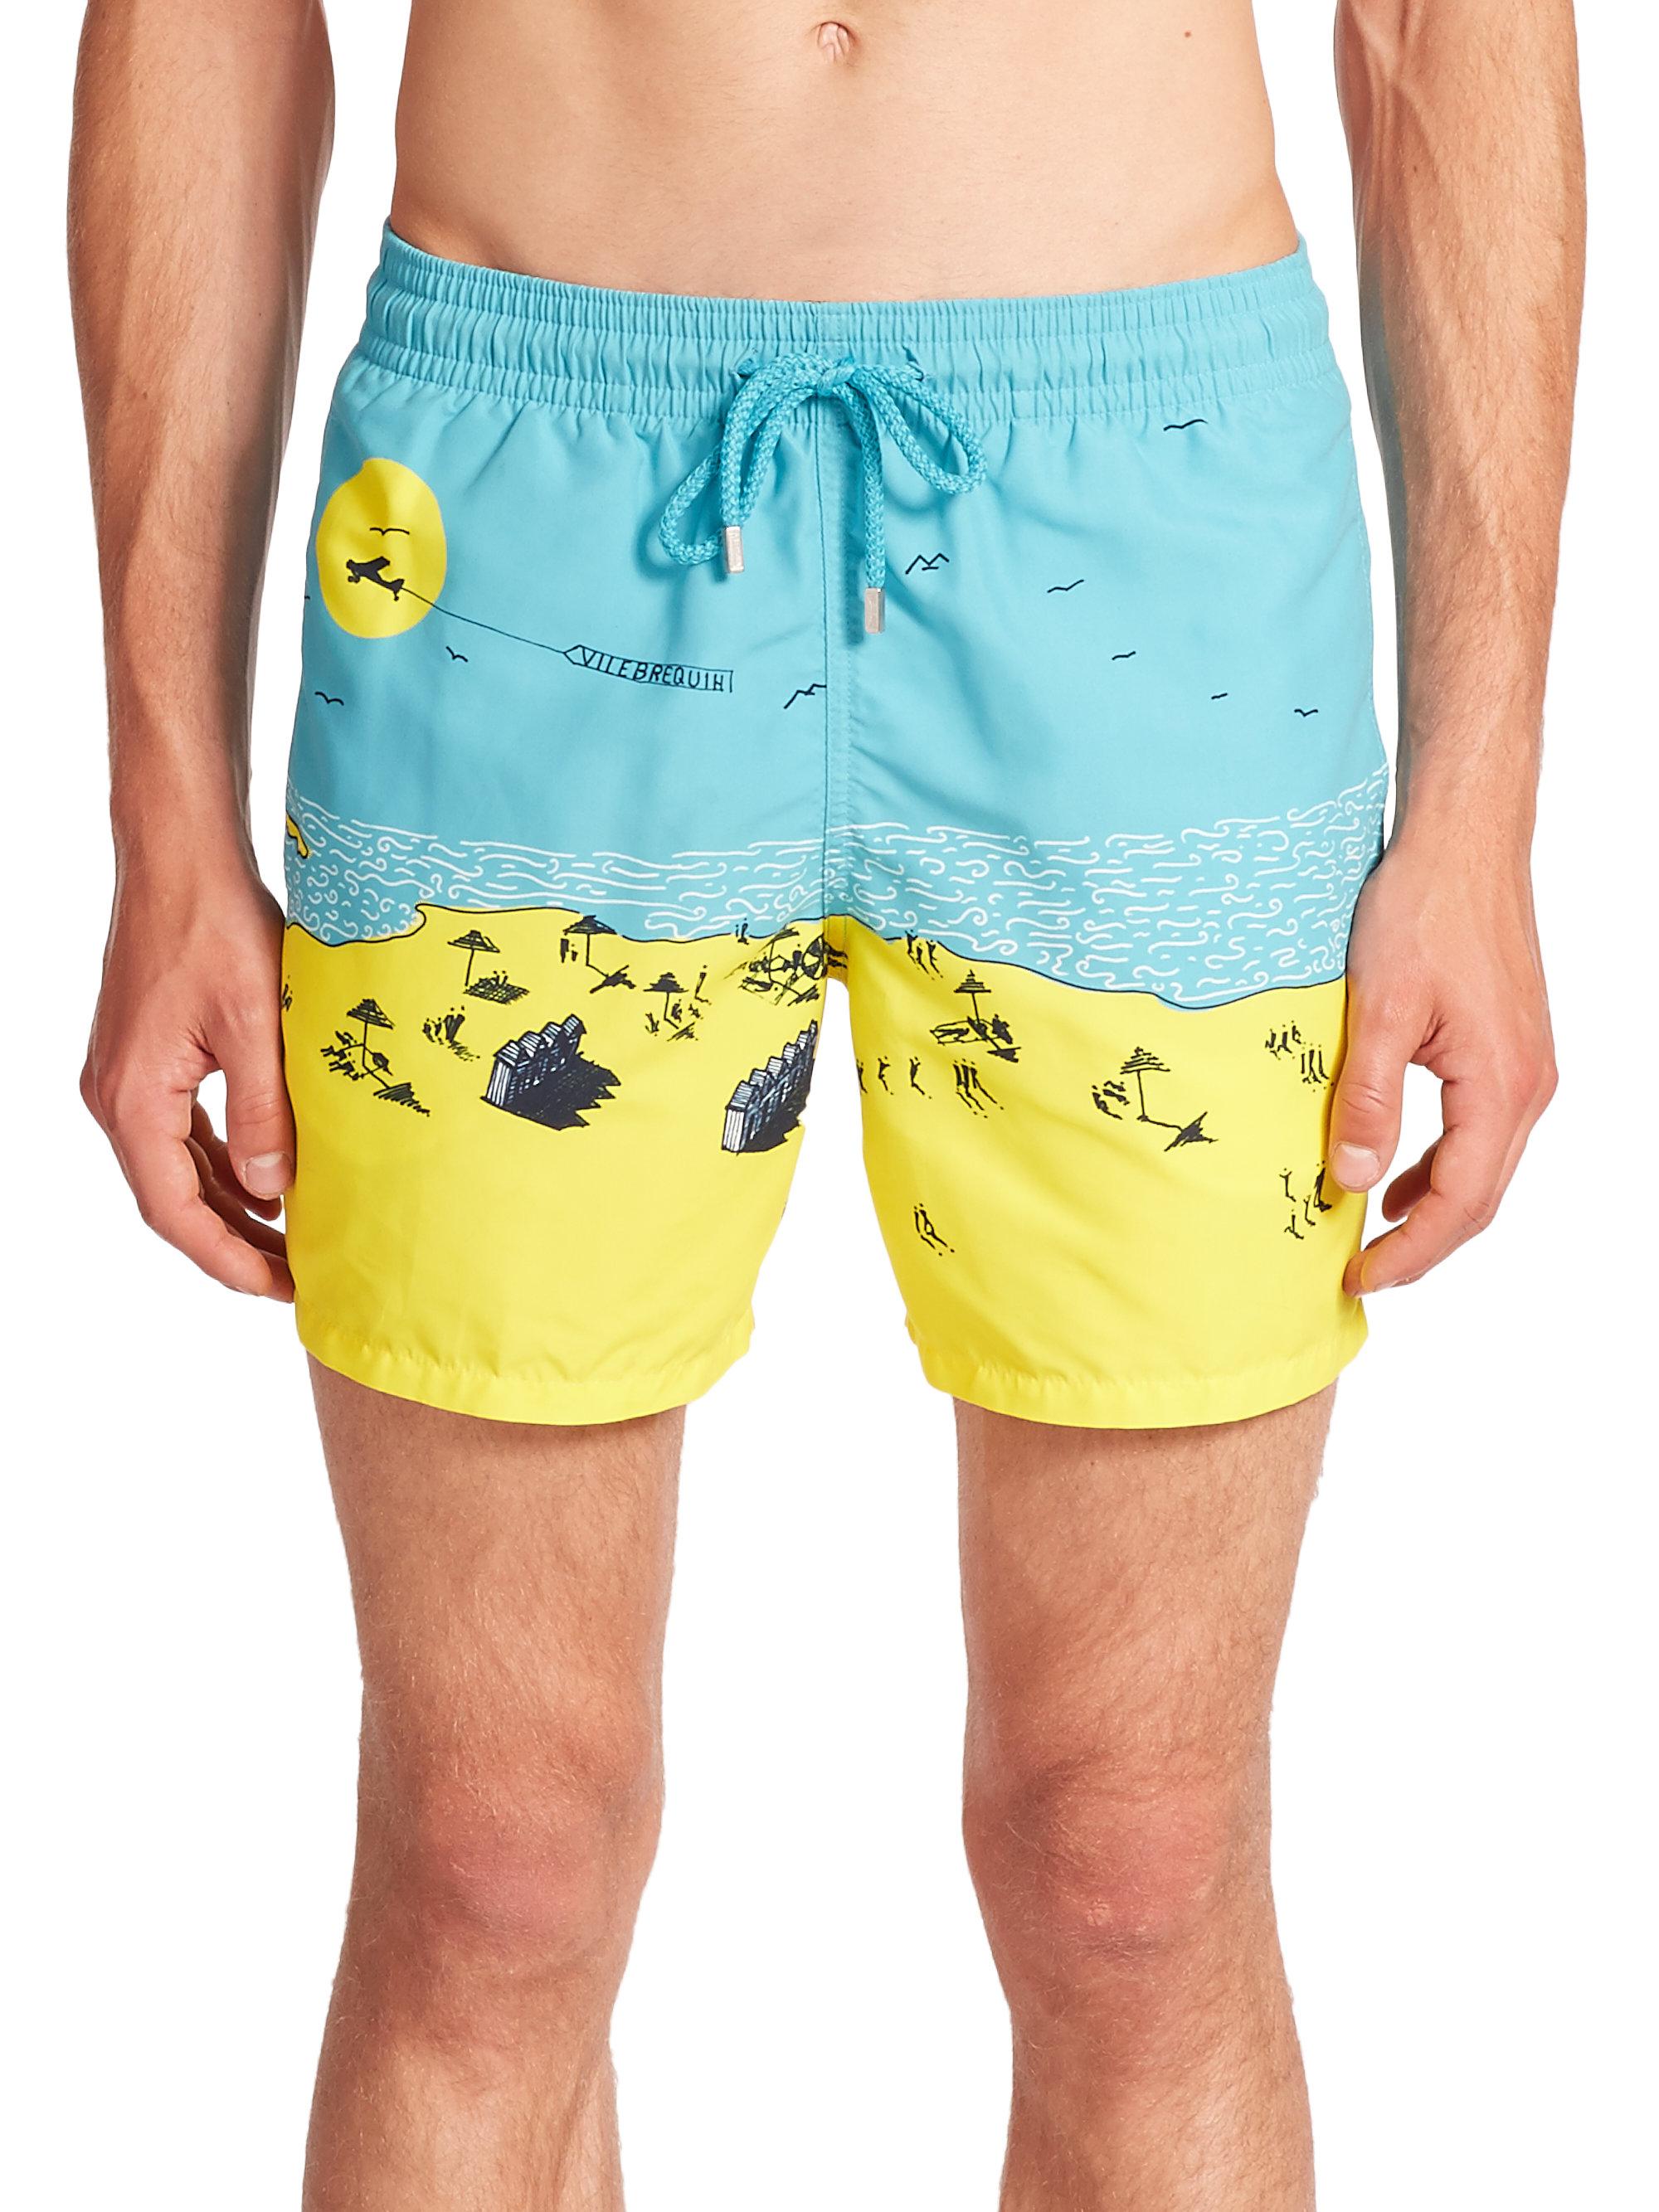 44c070ec2e Vilebrequin Beach-print Swim Trunks in Blue for Men - Lyst